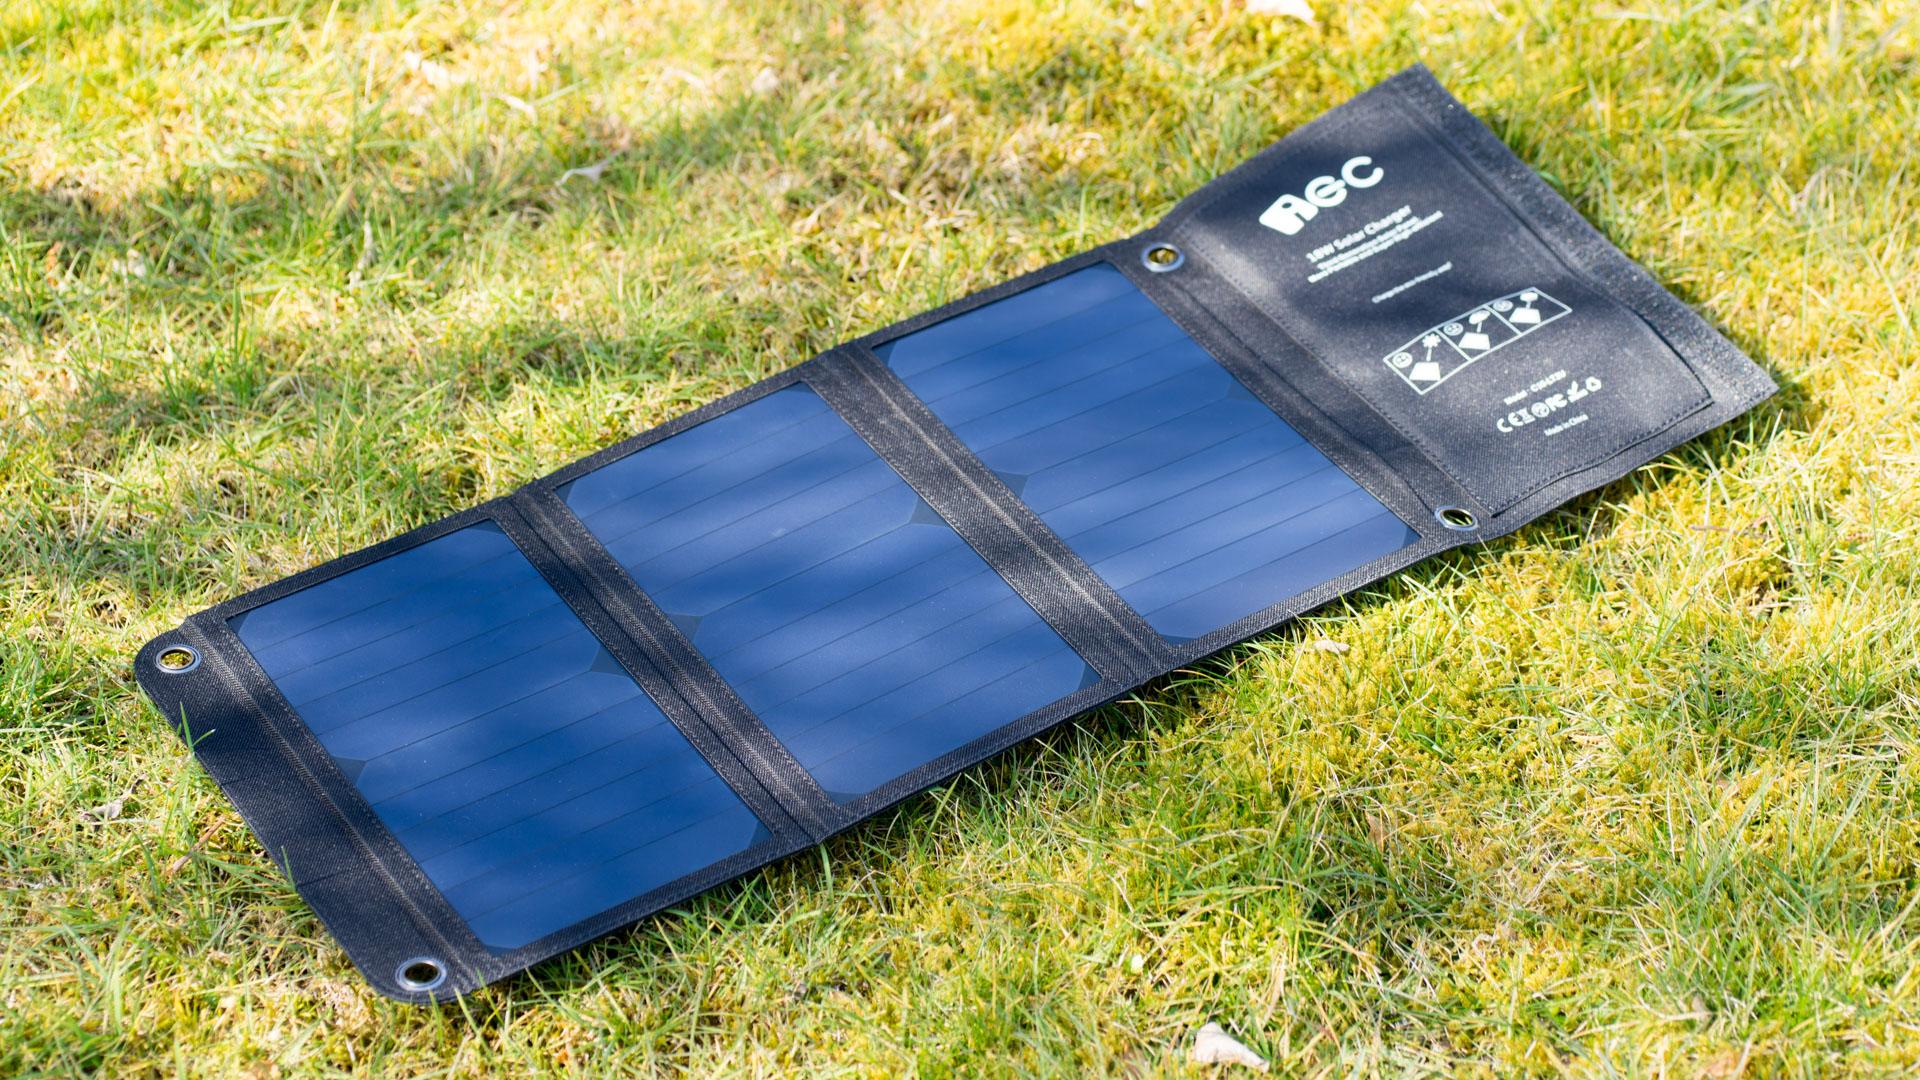 kompaktes und leistungsstarke usb solar panel im test das. Black Bedroom Furniture Sets. Home Design Ideas